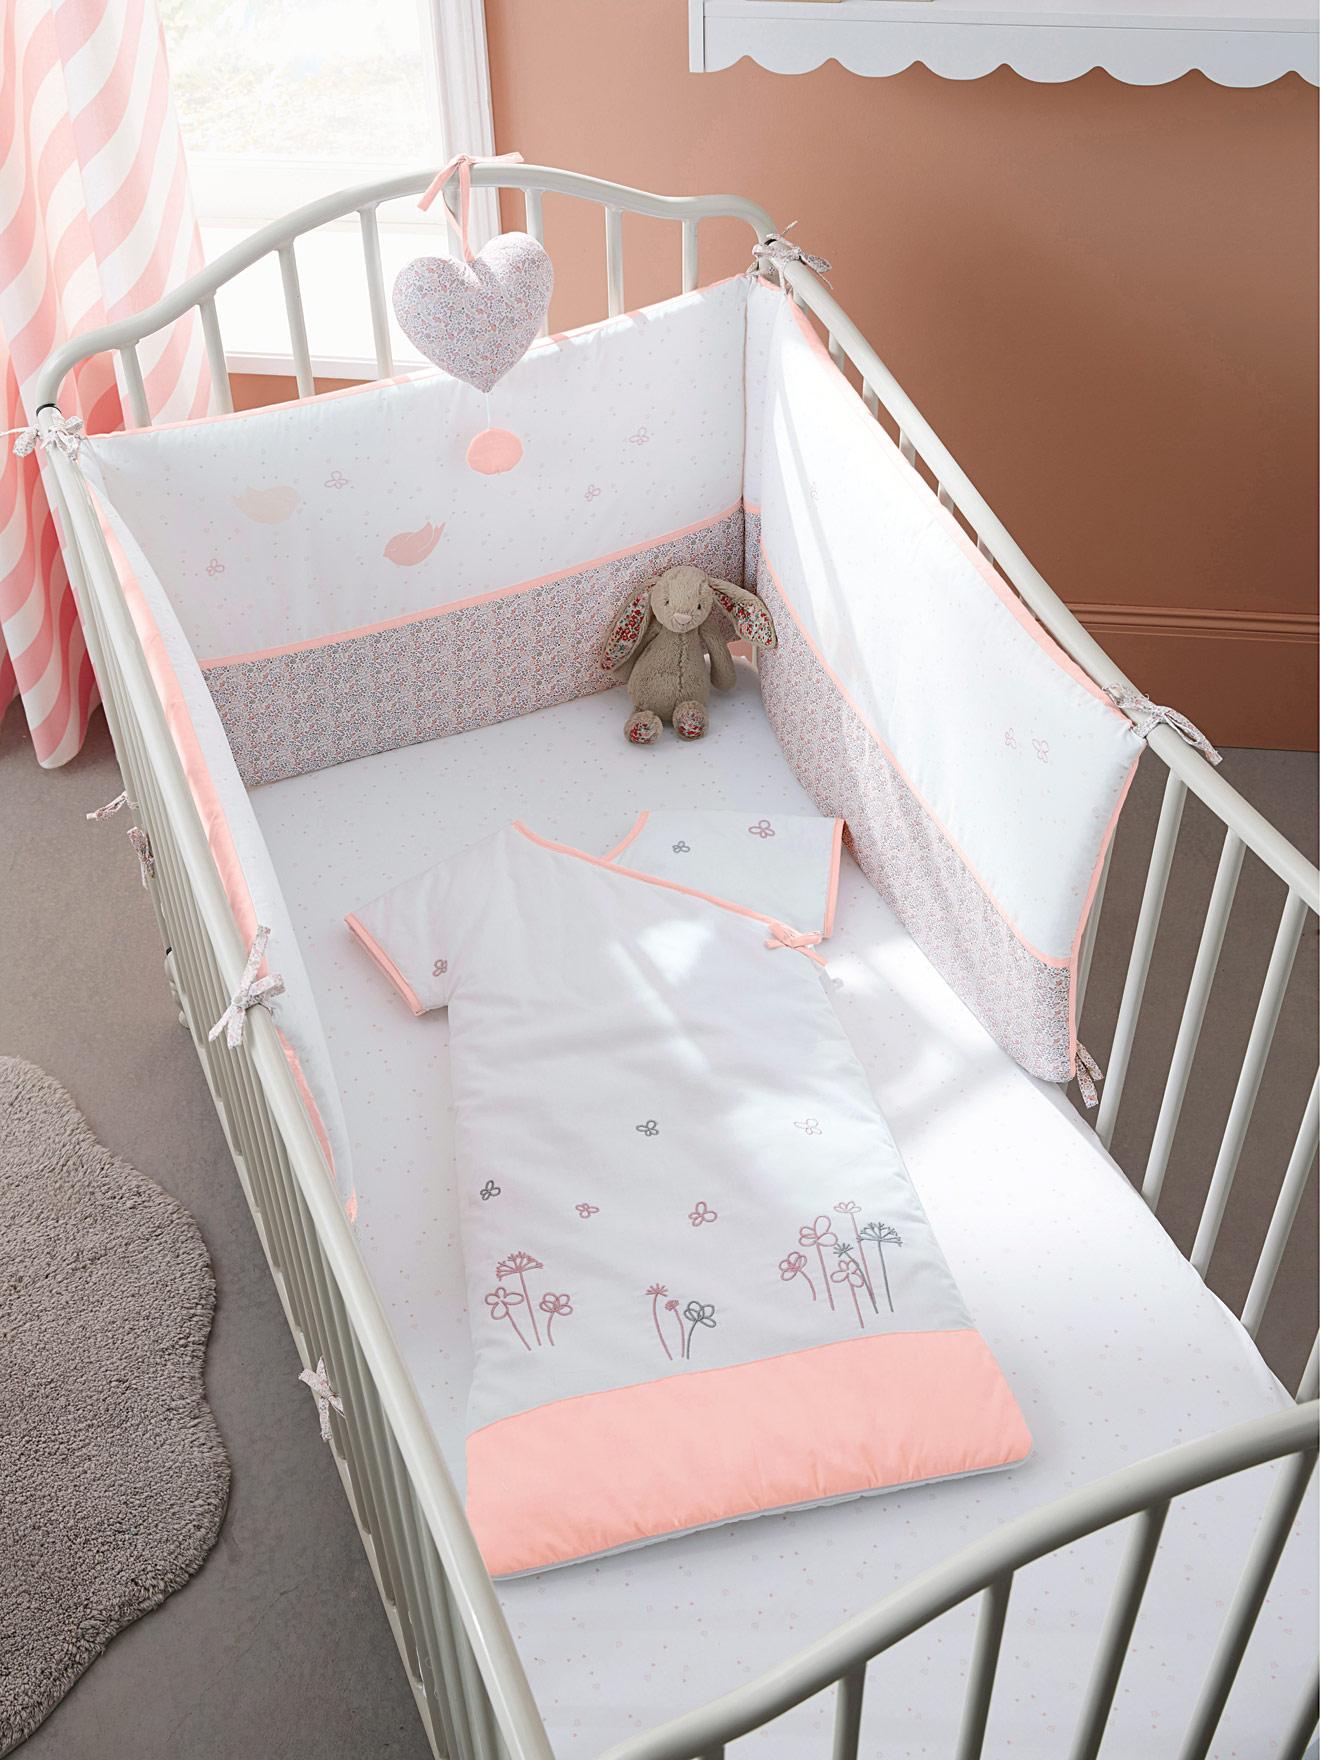 tour de lit vertbaudet ropa de cama y cuna vertbaudet felices sueos with tour de lit vertbaudet. Black Bedroom Furniture Sets. Home Design Ideas